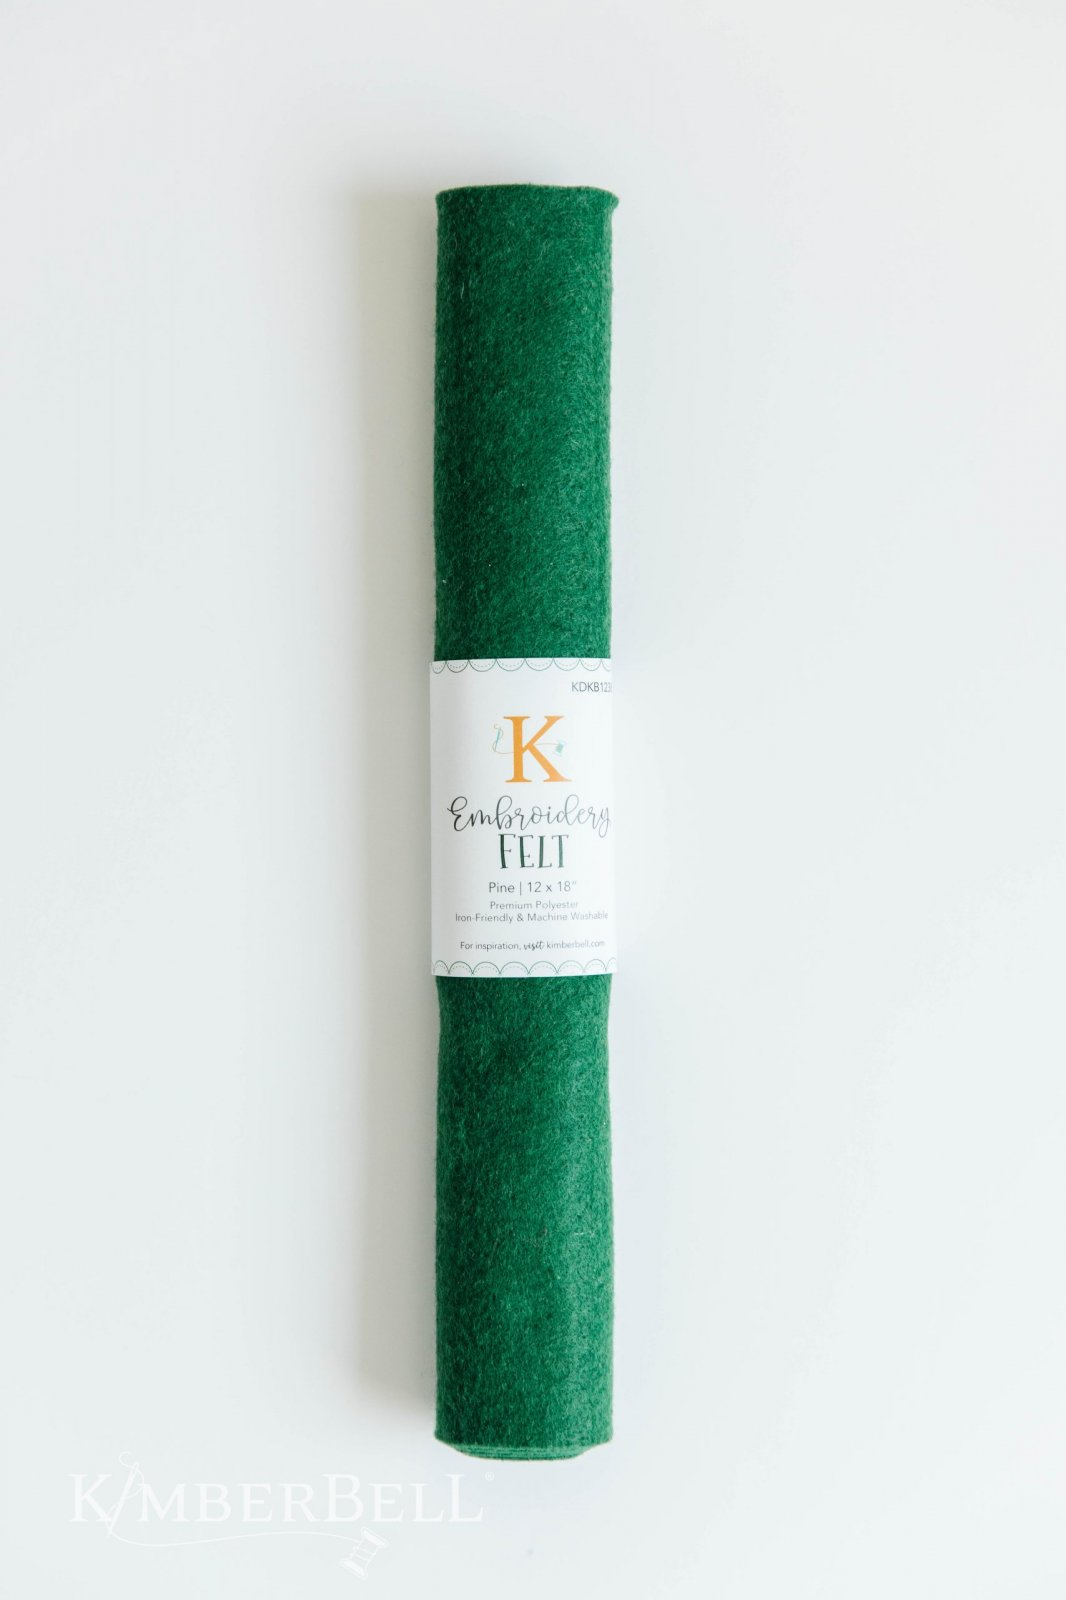 Kimberbell 12 x 18 Felt - Pine